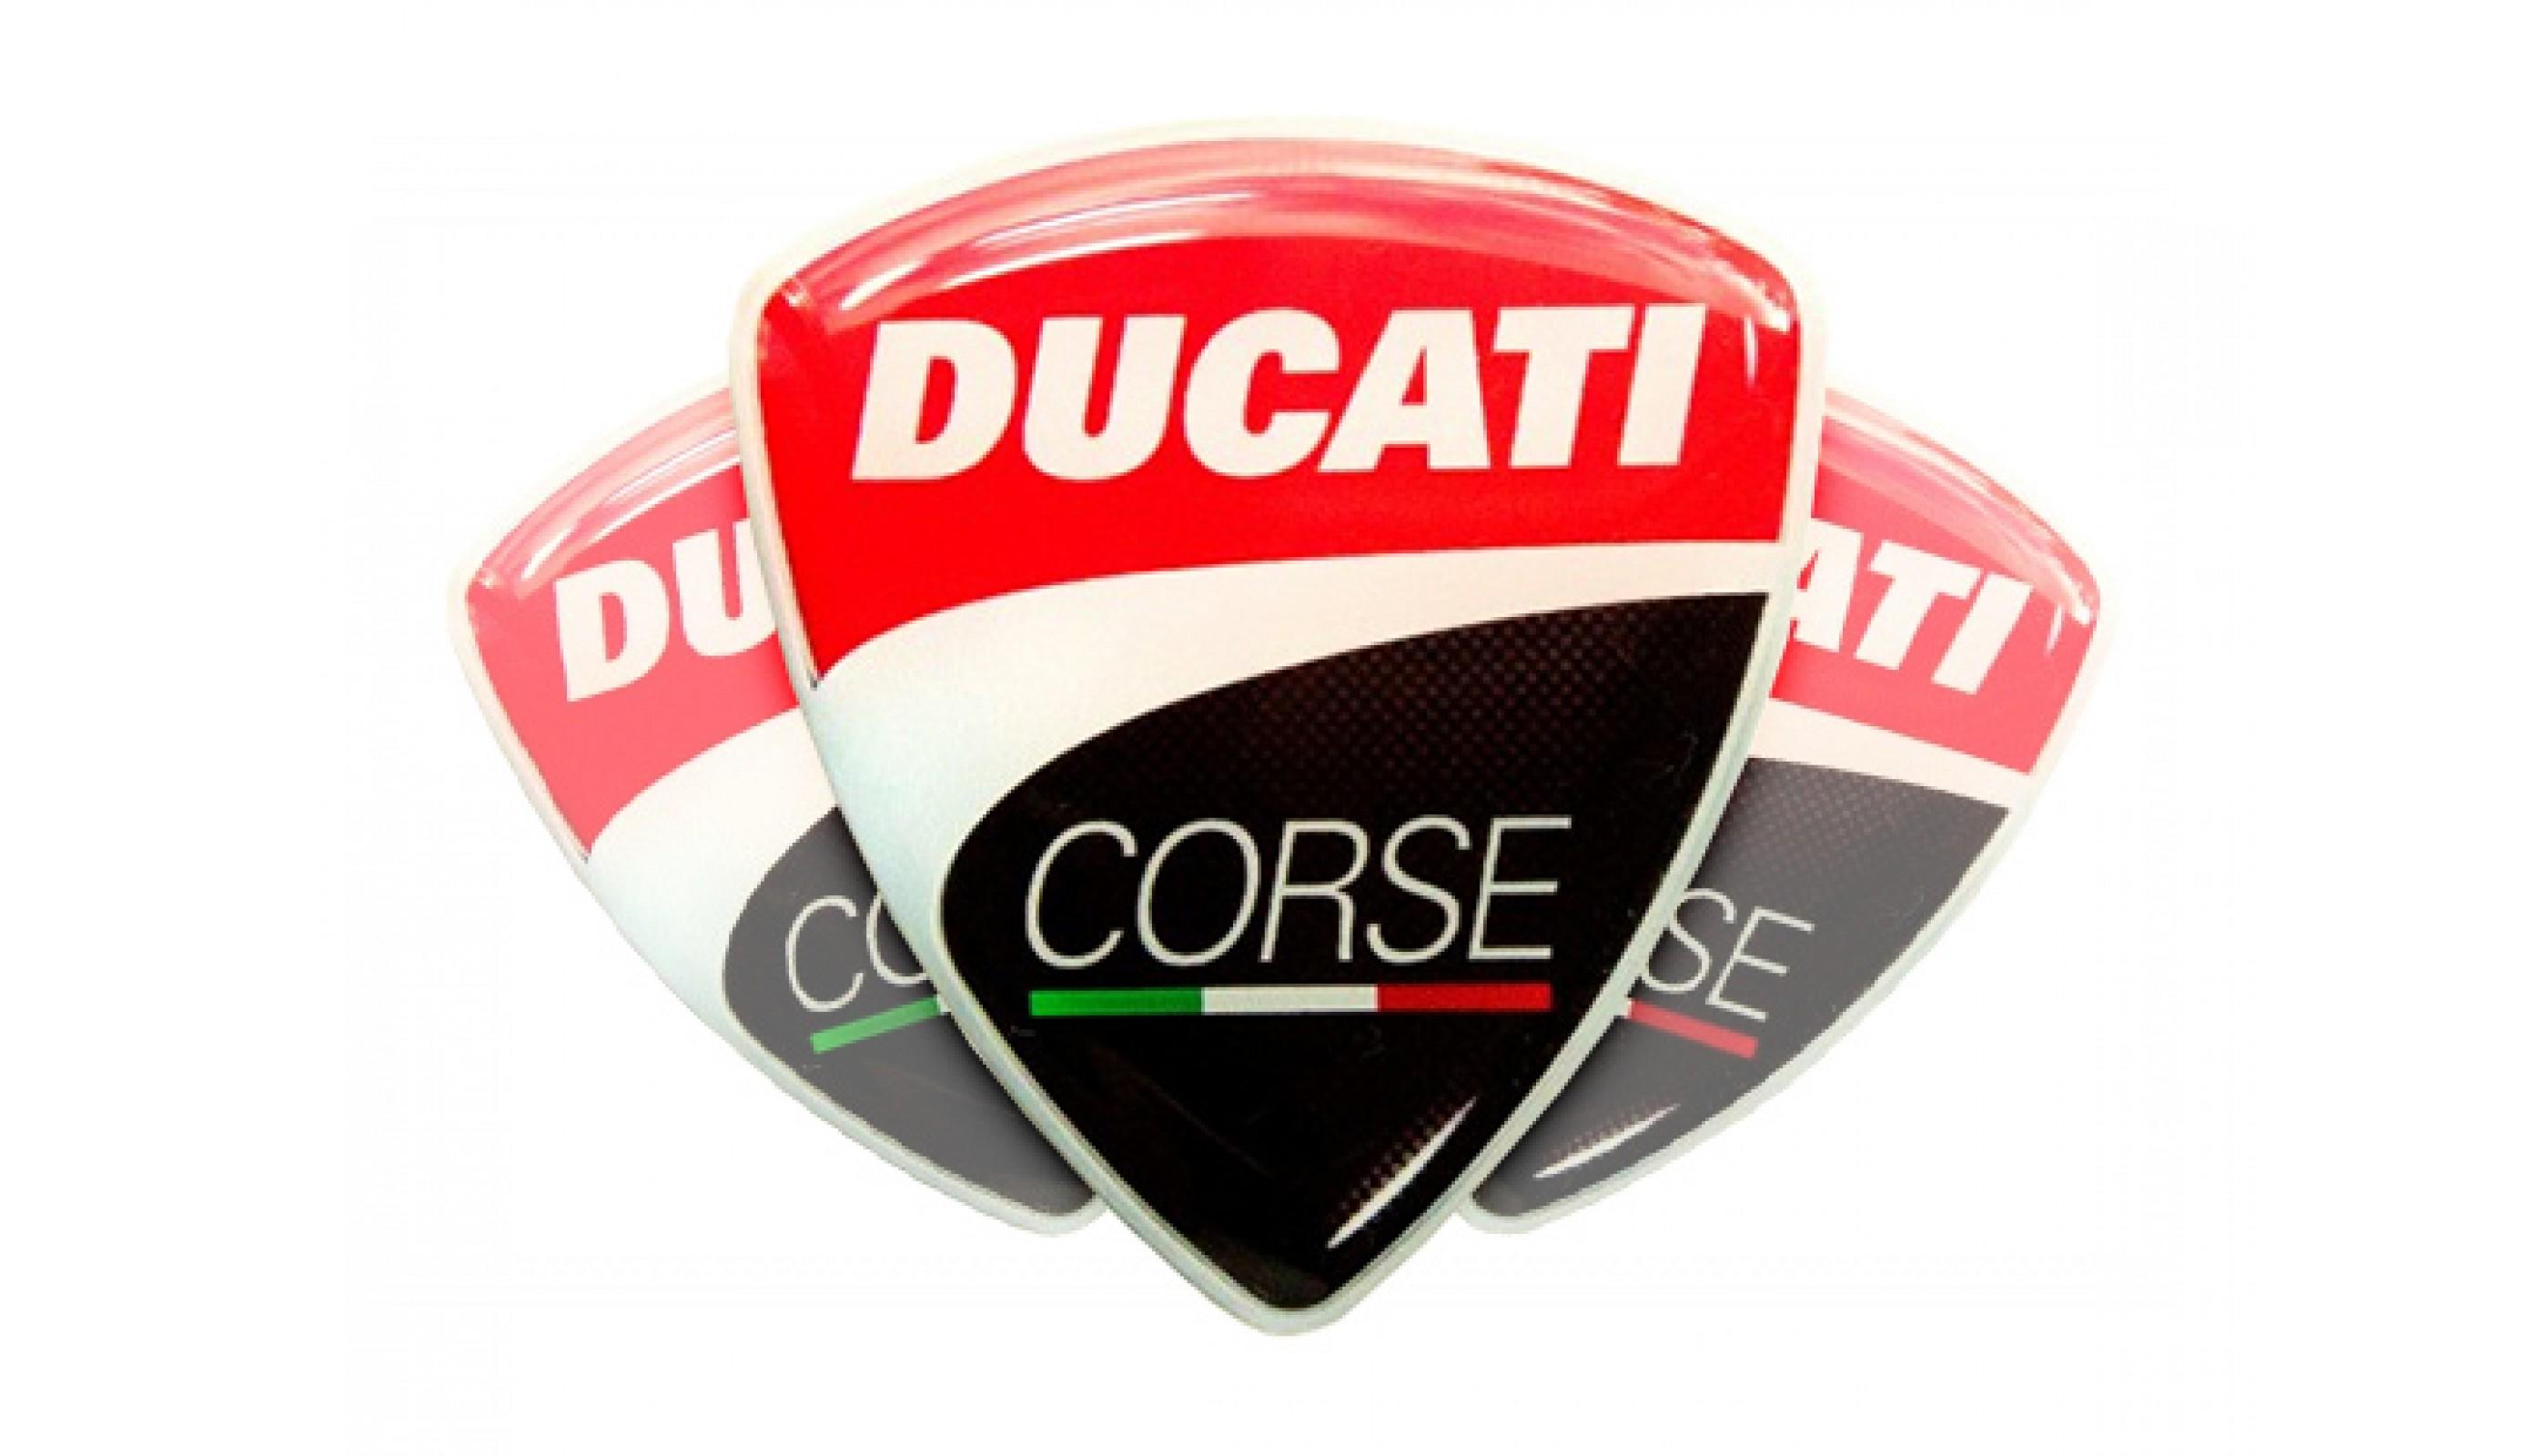 Ducati Corse domed emblems